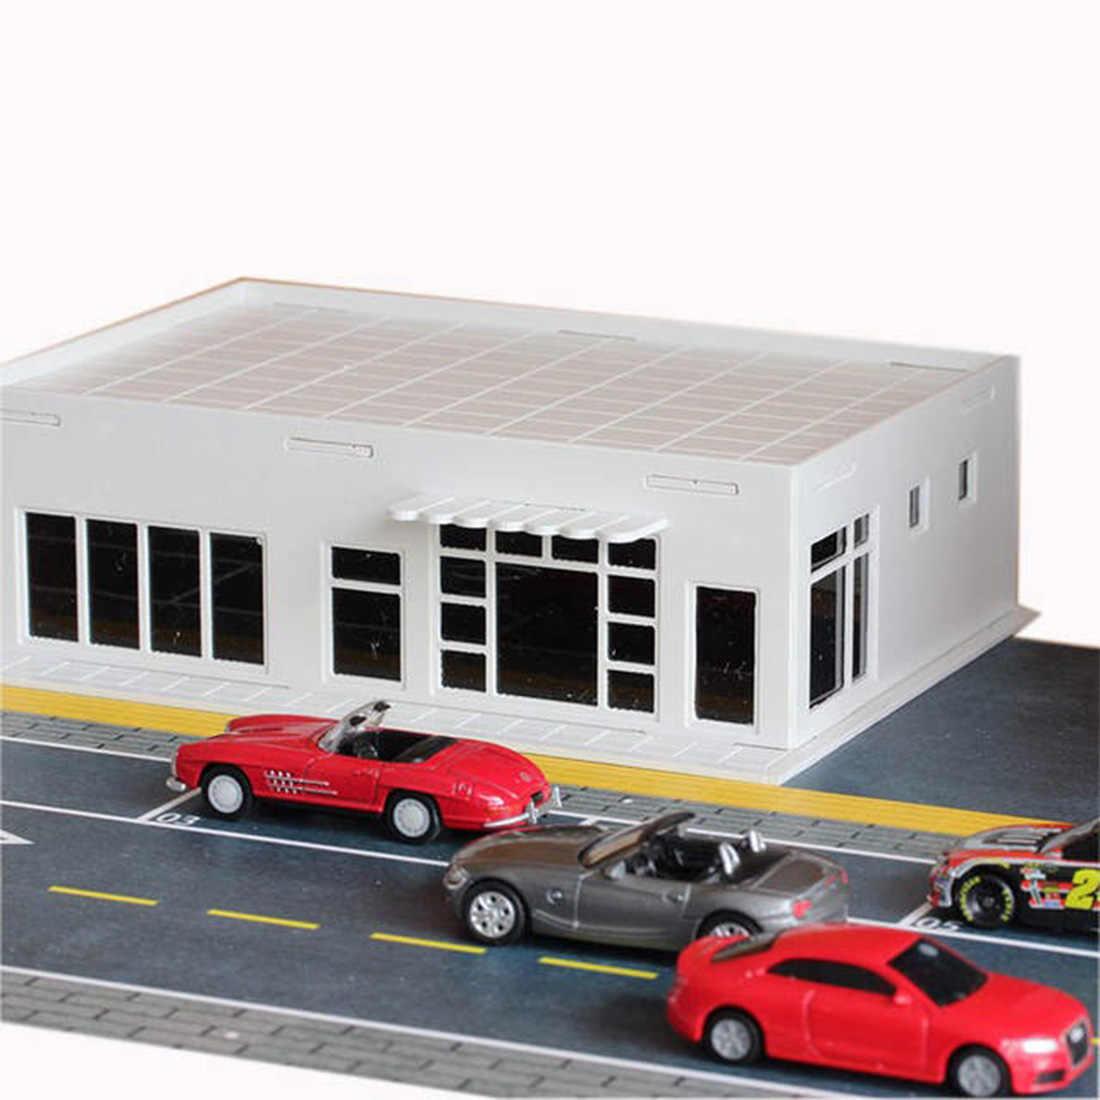 1:87 HO Scale DIY 조립 슈퍼마켓 편의점 건물 철도 풍경 모래 테이블 레이아웃 어린이 완구